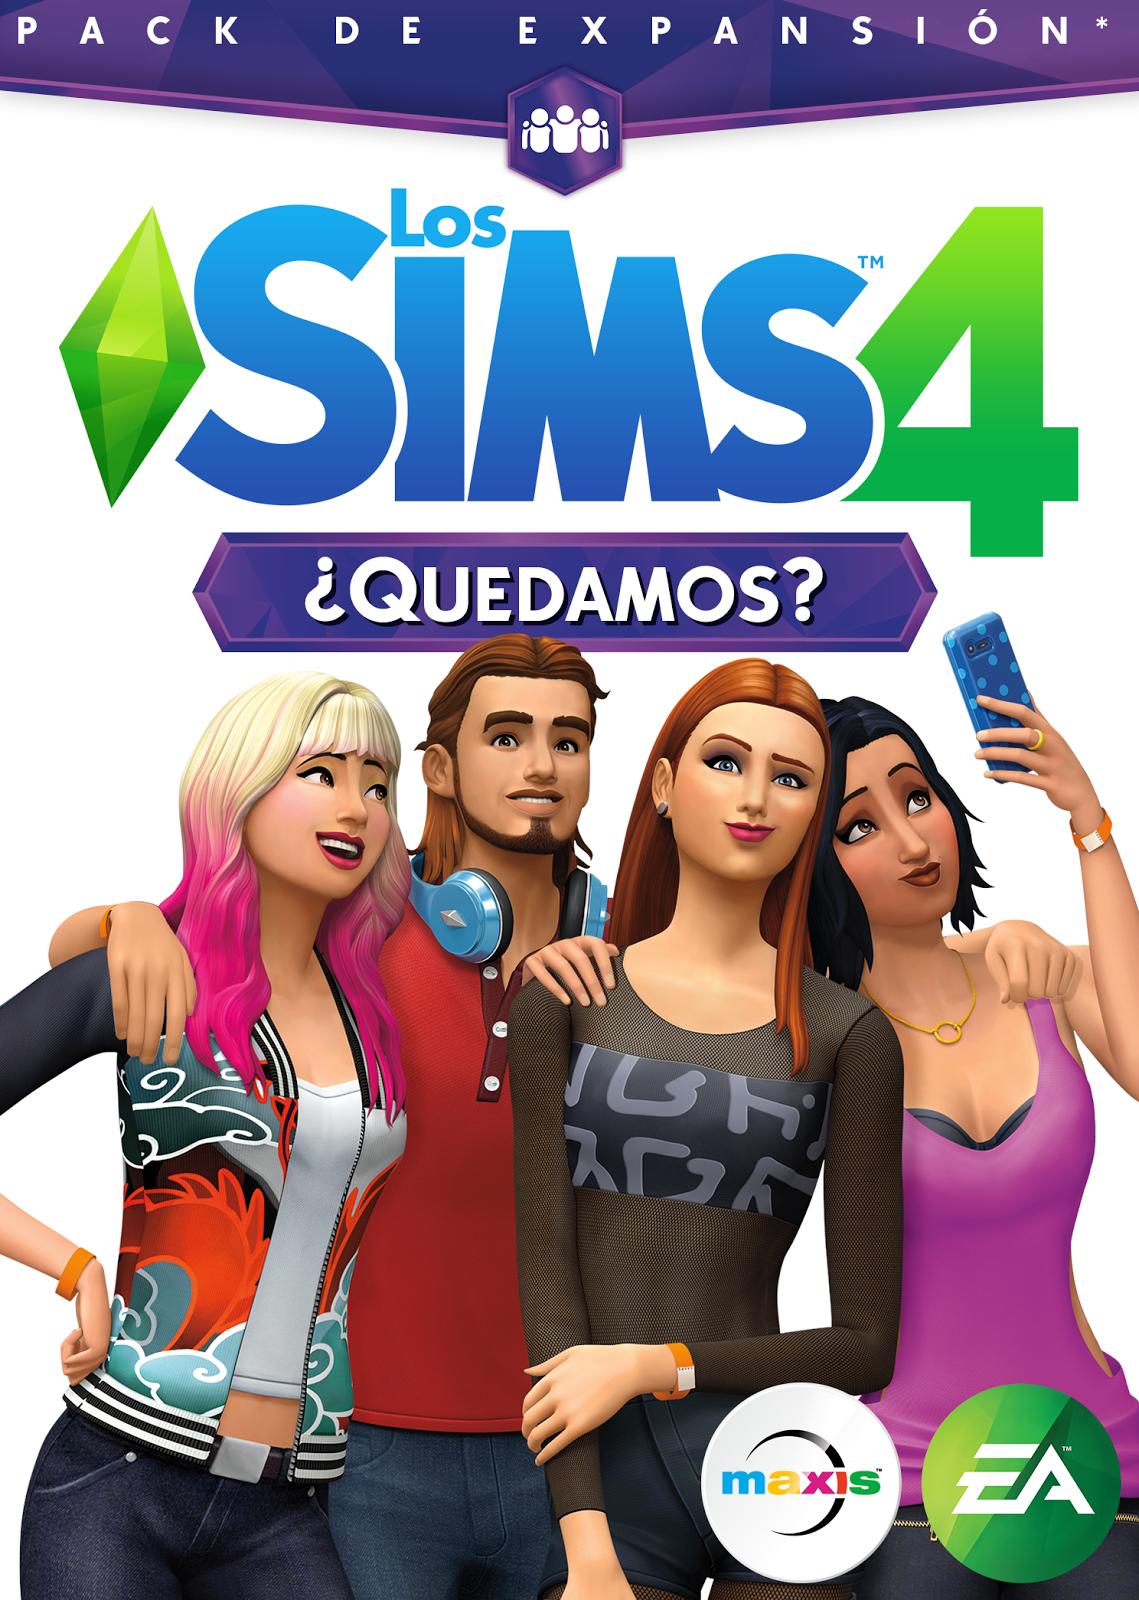 Los Sims 4 Quedamos Pack De Expansión Sims 4 Sims 4 Expansiones Sims